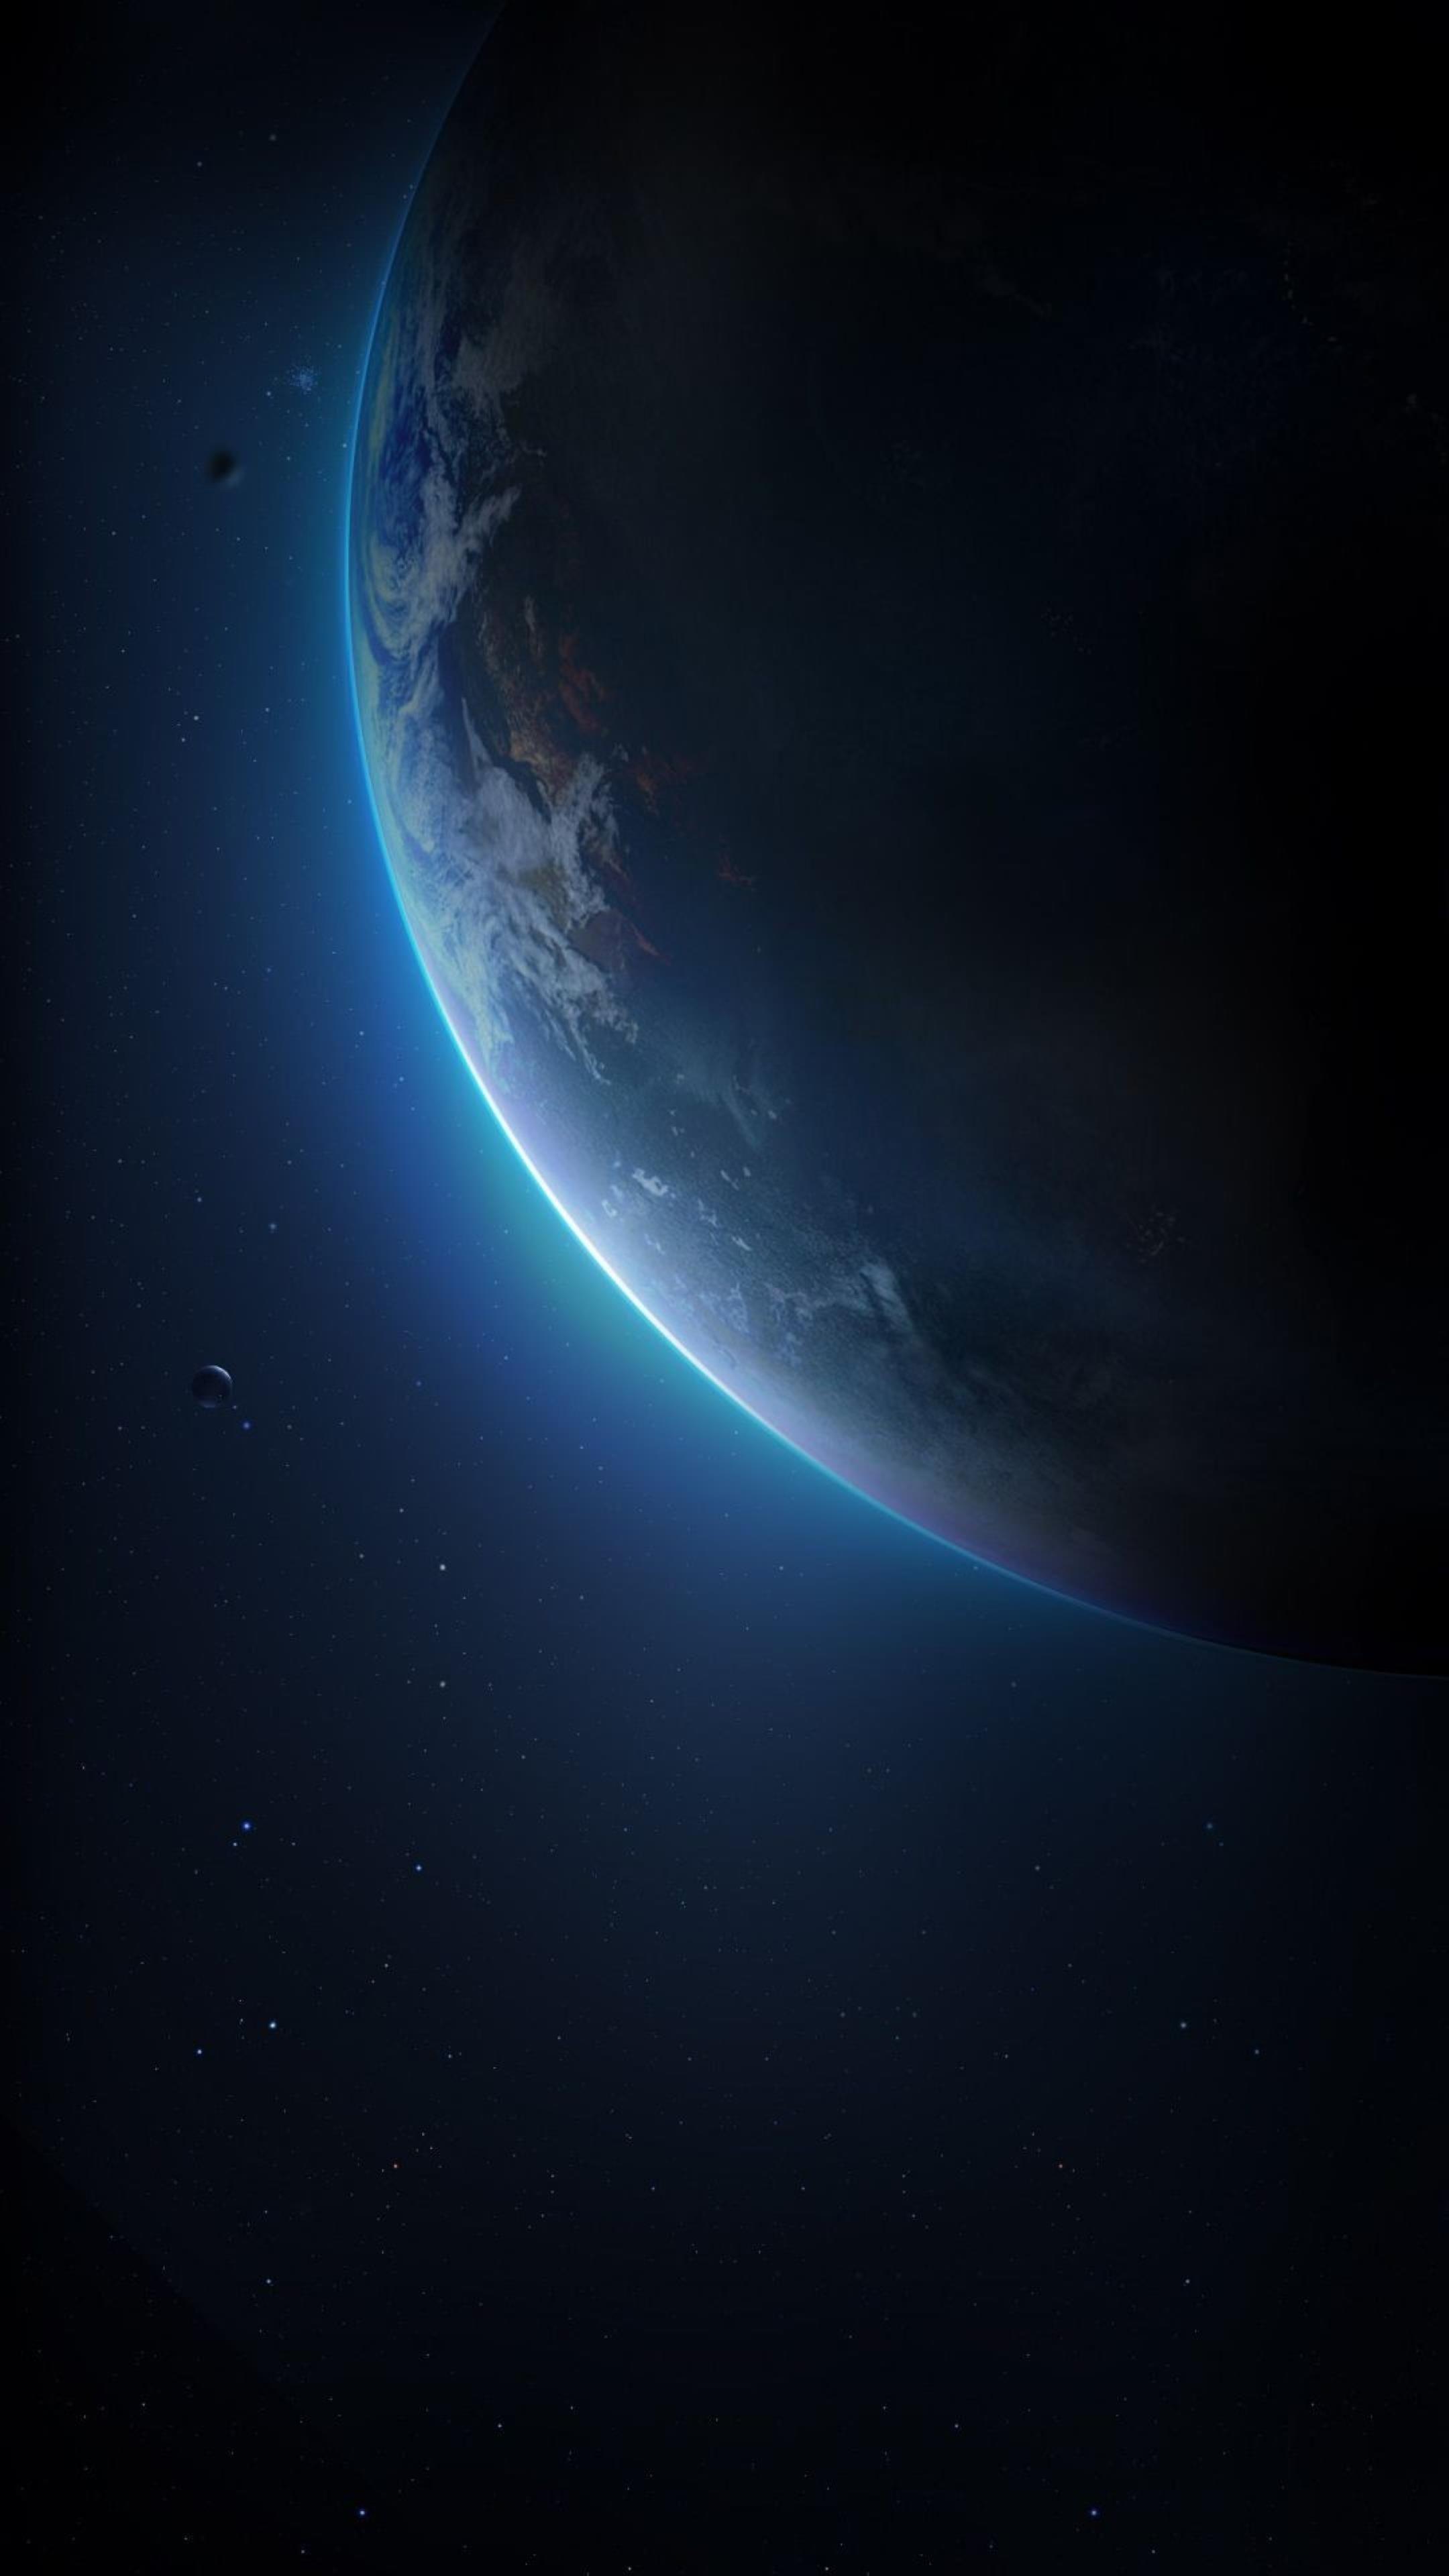 Space 4k Wallpaper 45 Ruang Angkasa Galaksi Bima Sakti Langit Malam